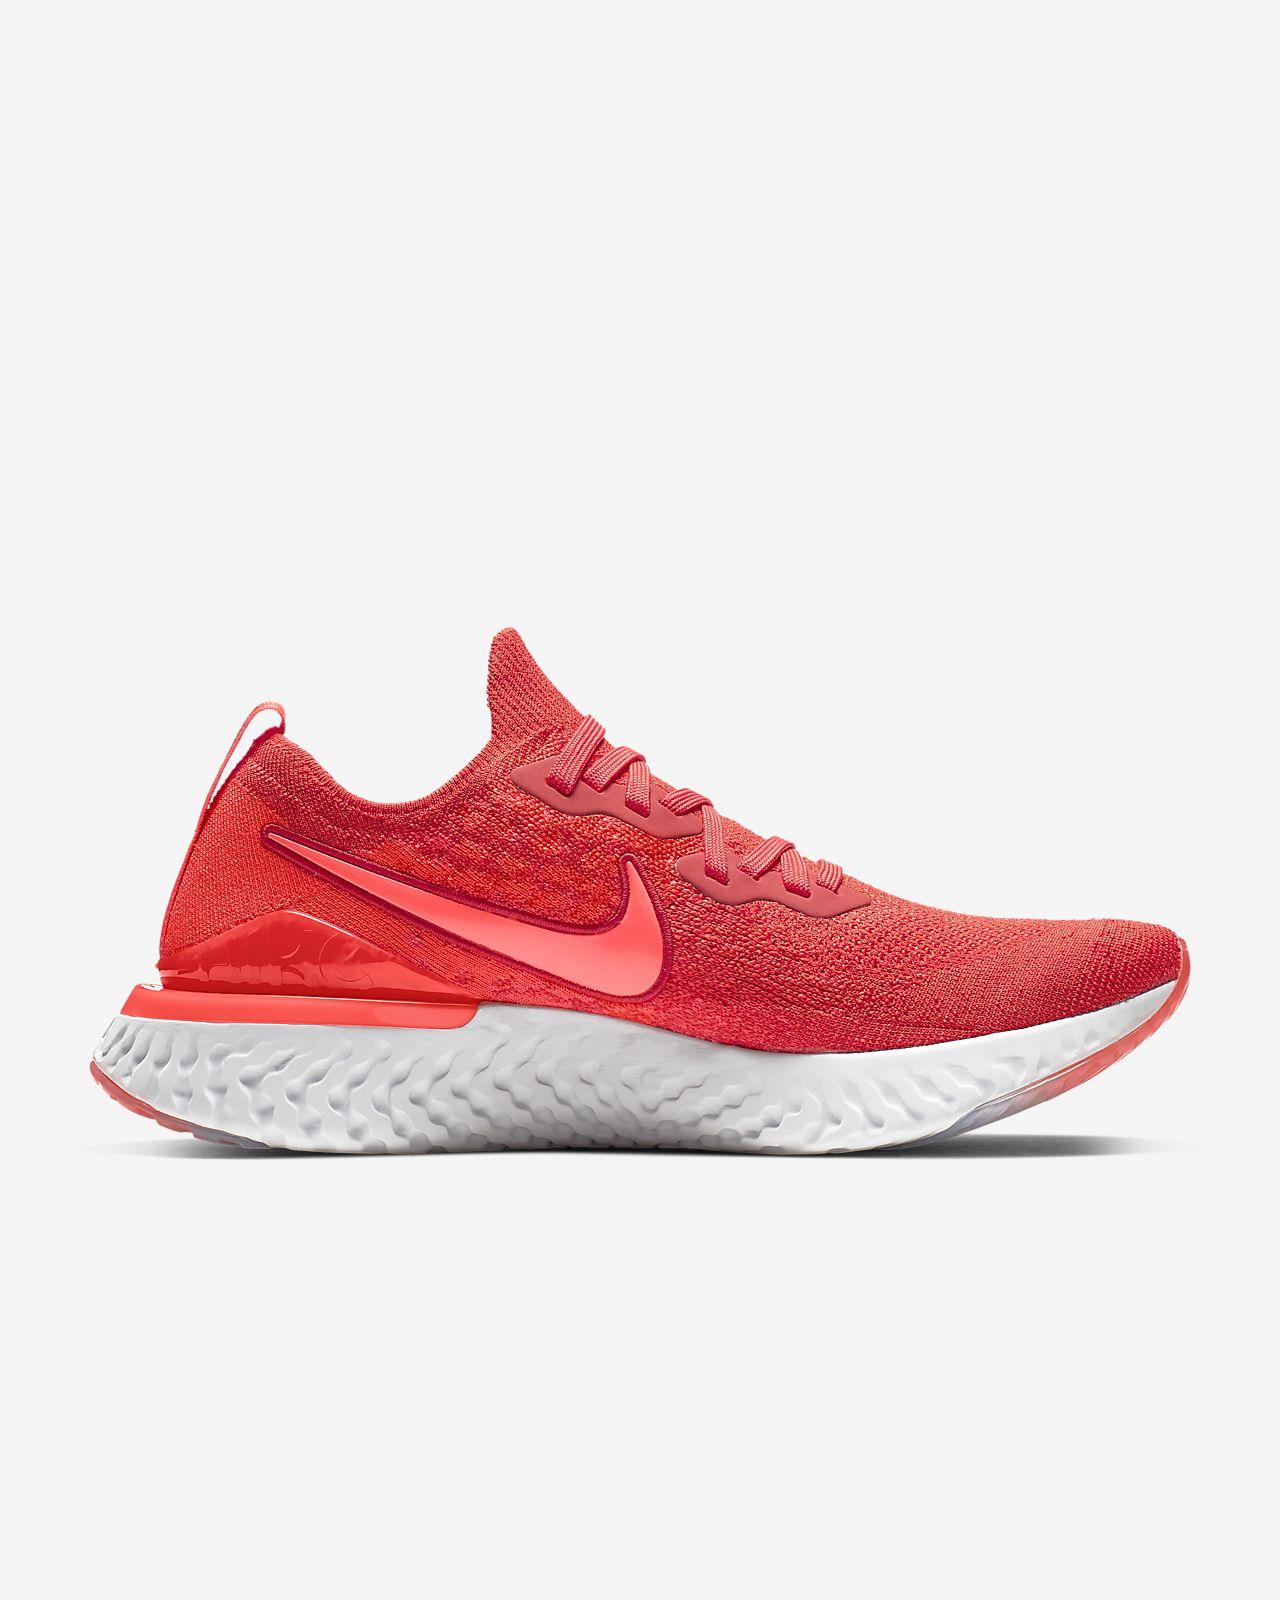 1d967a02c92d Nike Epic React Flyknit 2 Men s Running Shoe. Nike.com NL